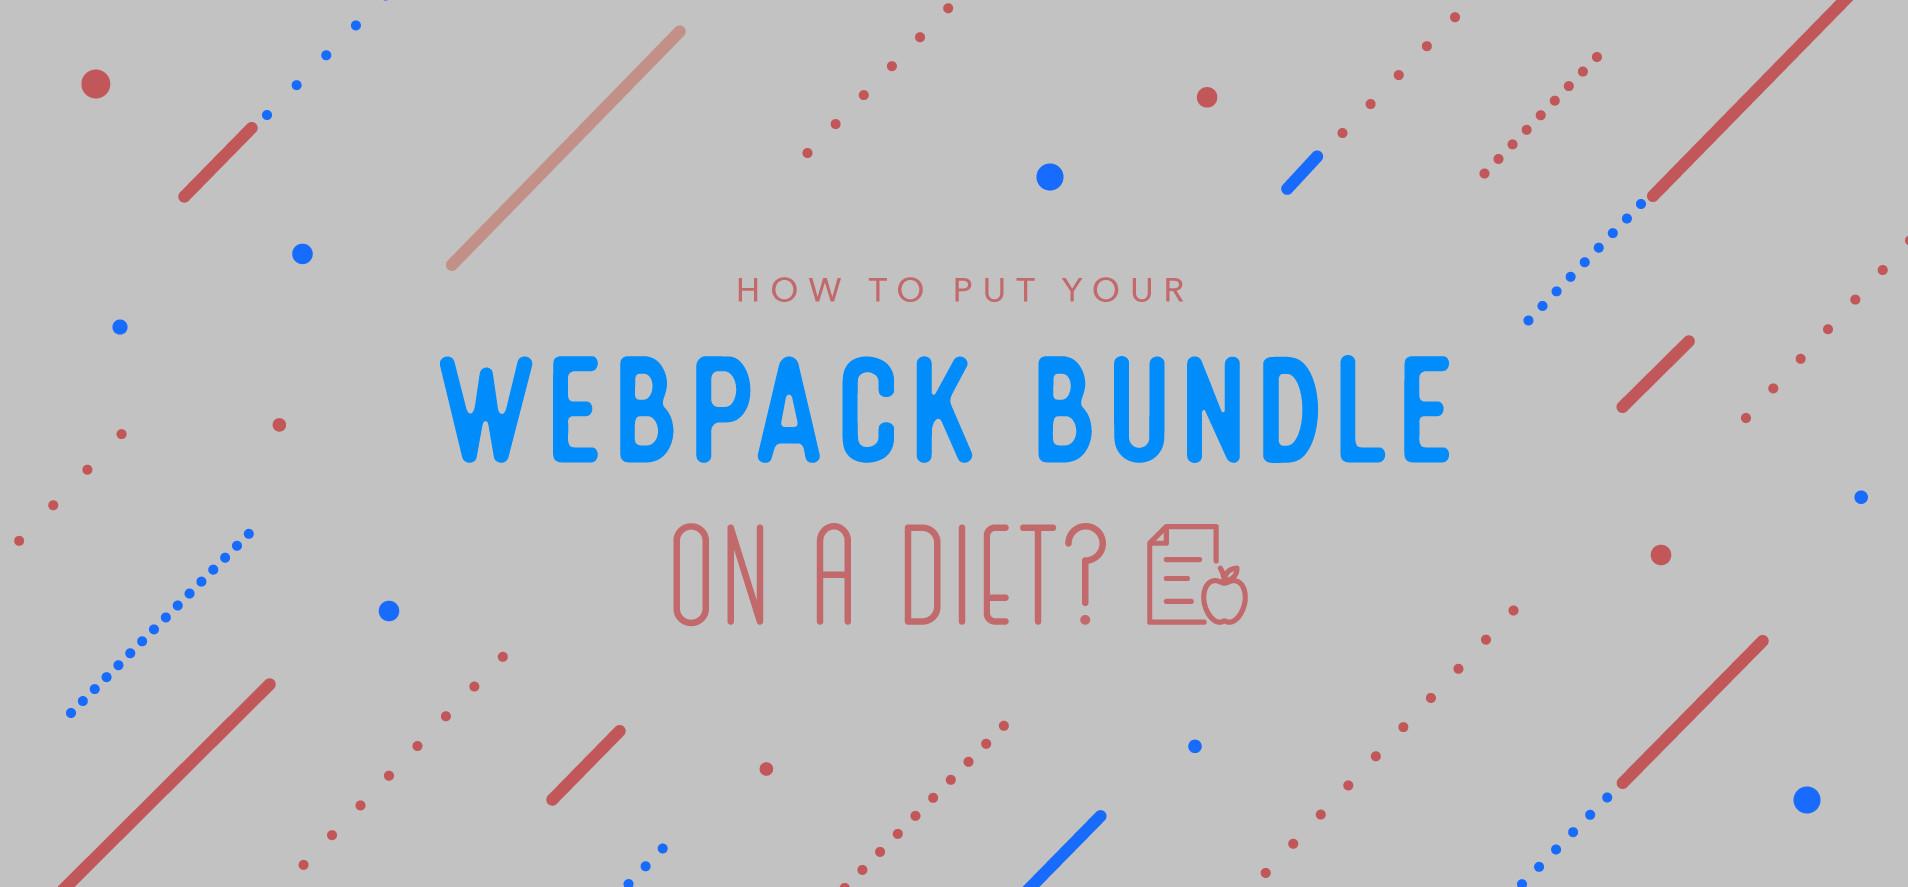 Put Your Webpack Bundle On A Diet - Part 3 | Contentful